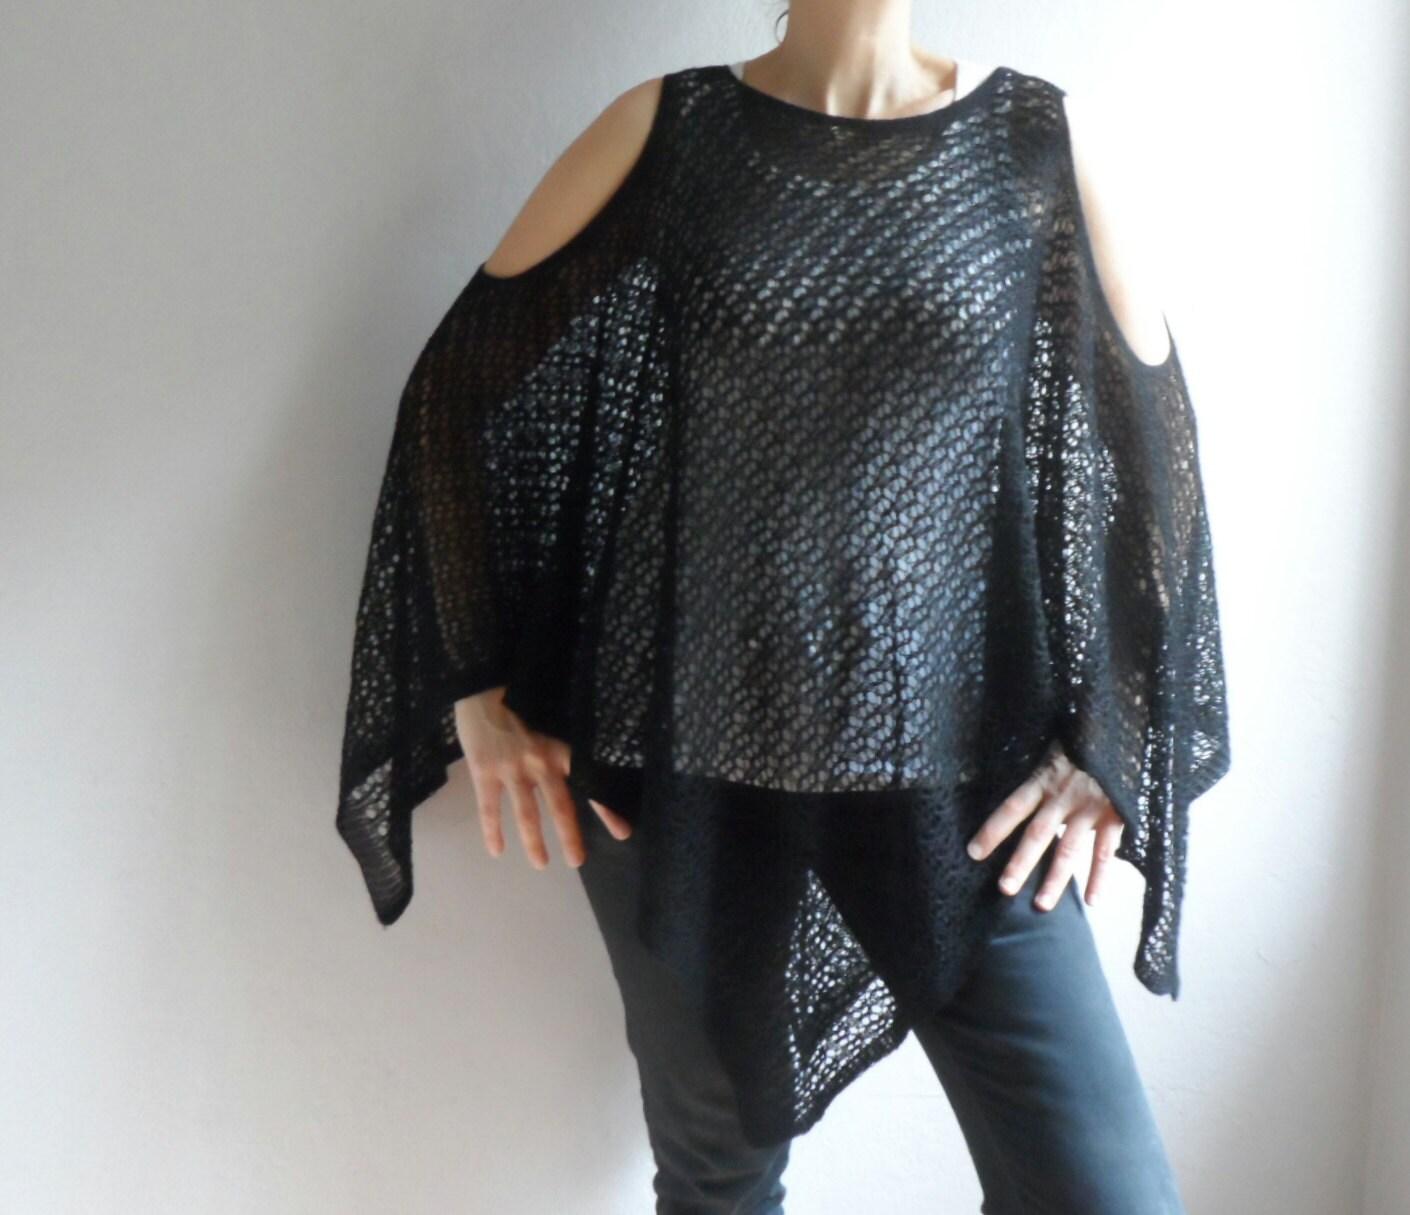 Knitting Summer Tunic : Women vest knit tunic summer blouse black